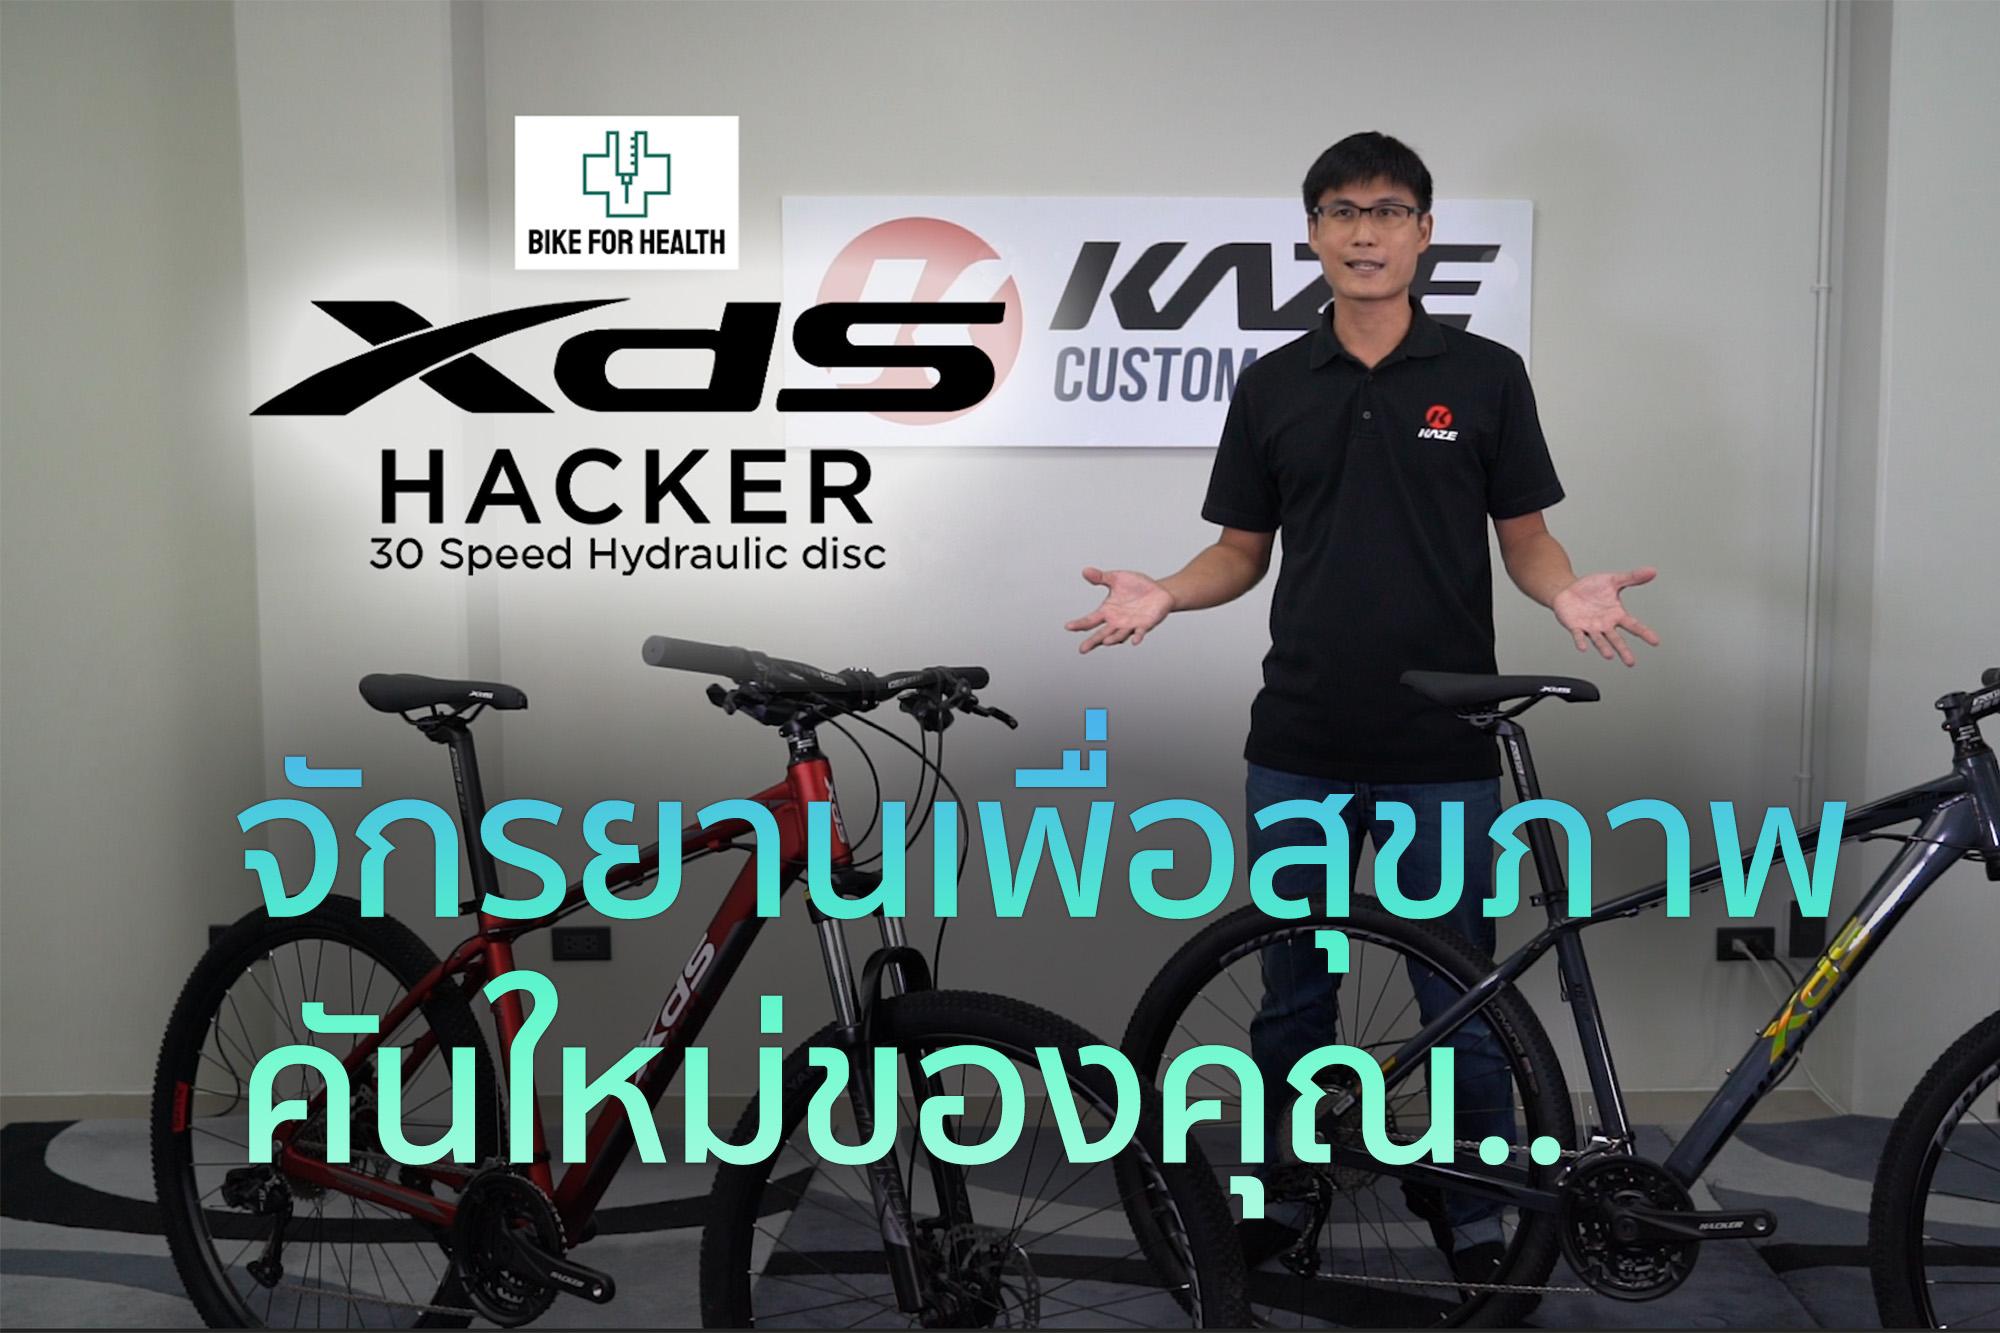 Mountainbike XDS - HACKER (30 speed Hydraulic disc brake)